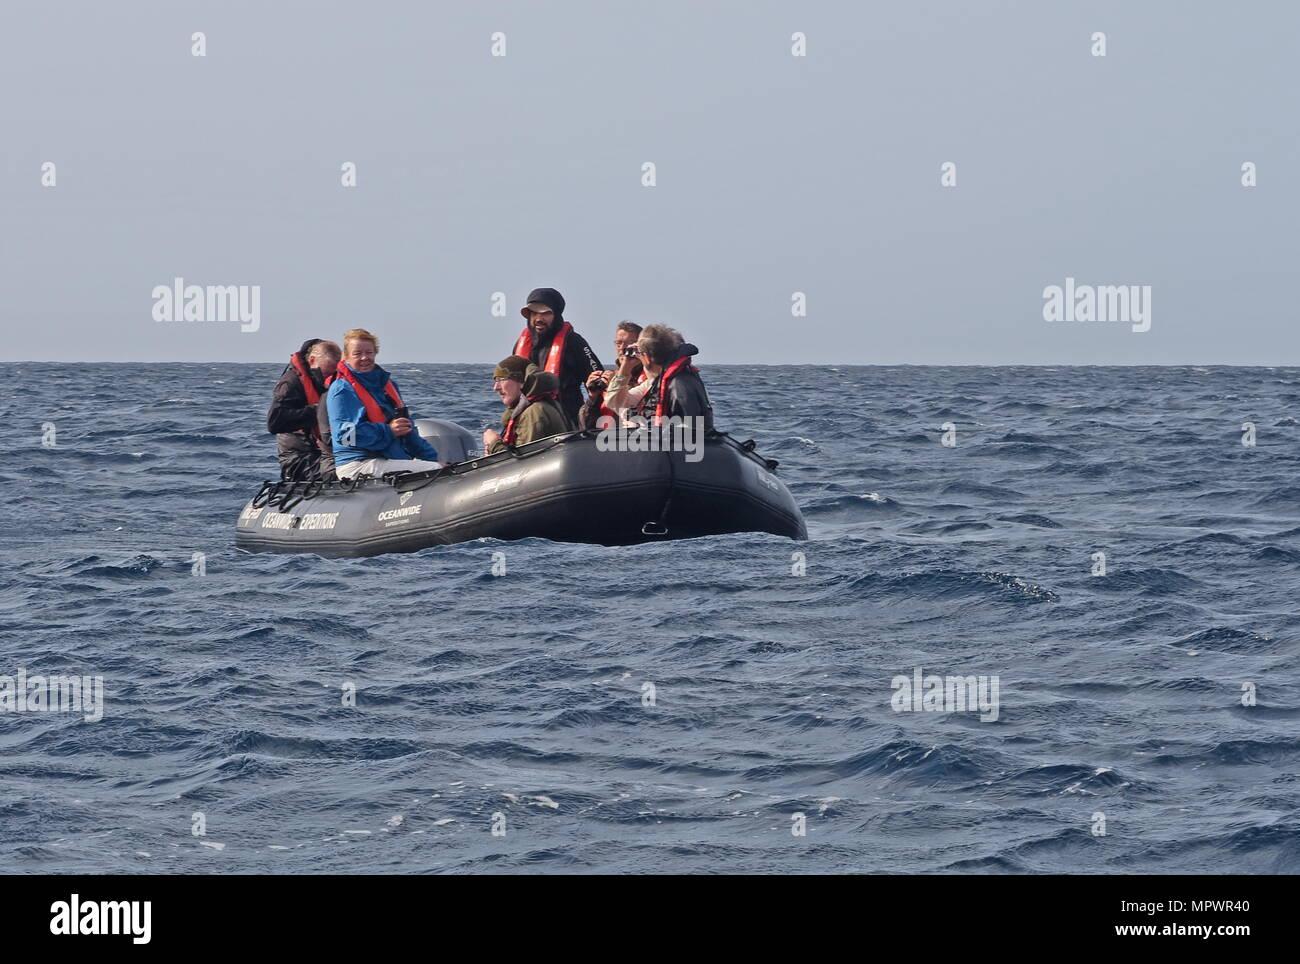 zodiac boat on open sea, passangers watching wildlife  Cape Verde, Atlantic Ocean                May - Stock Image